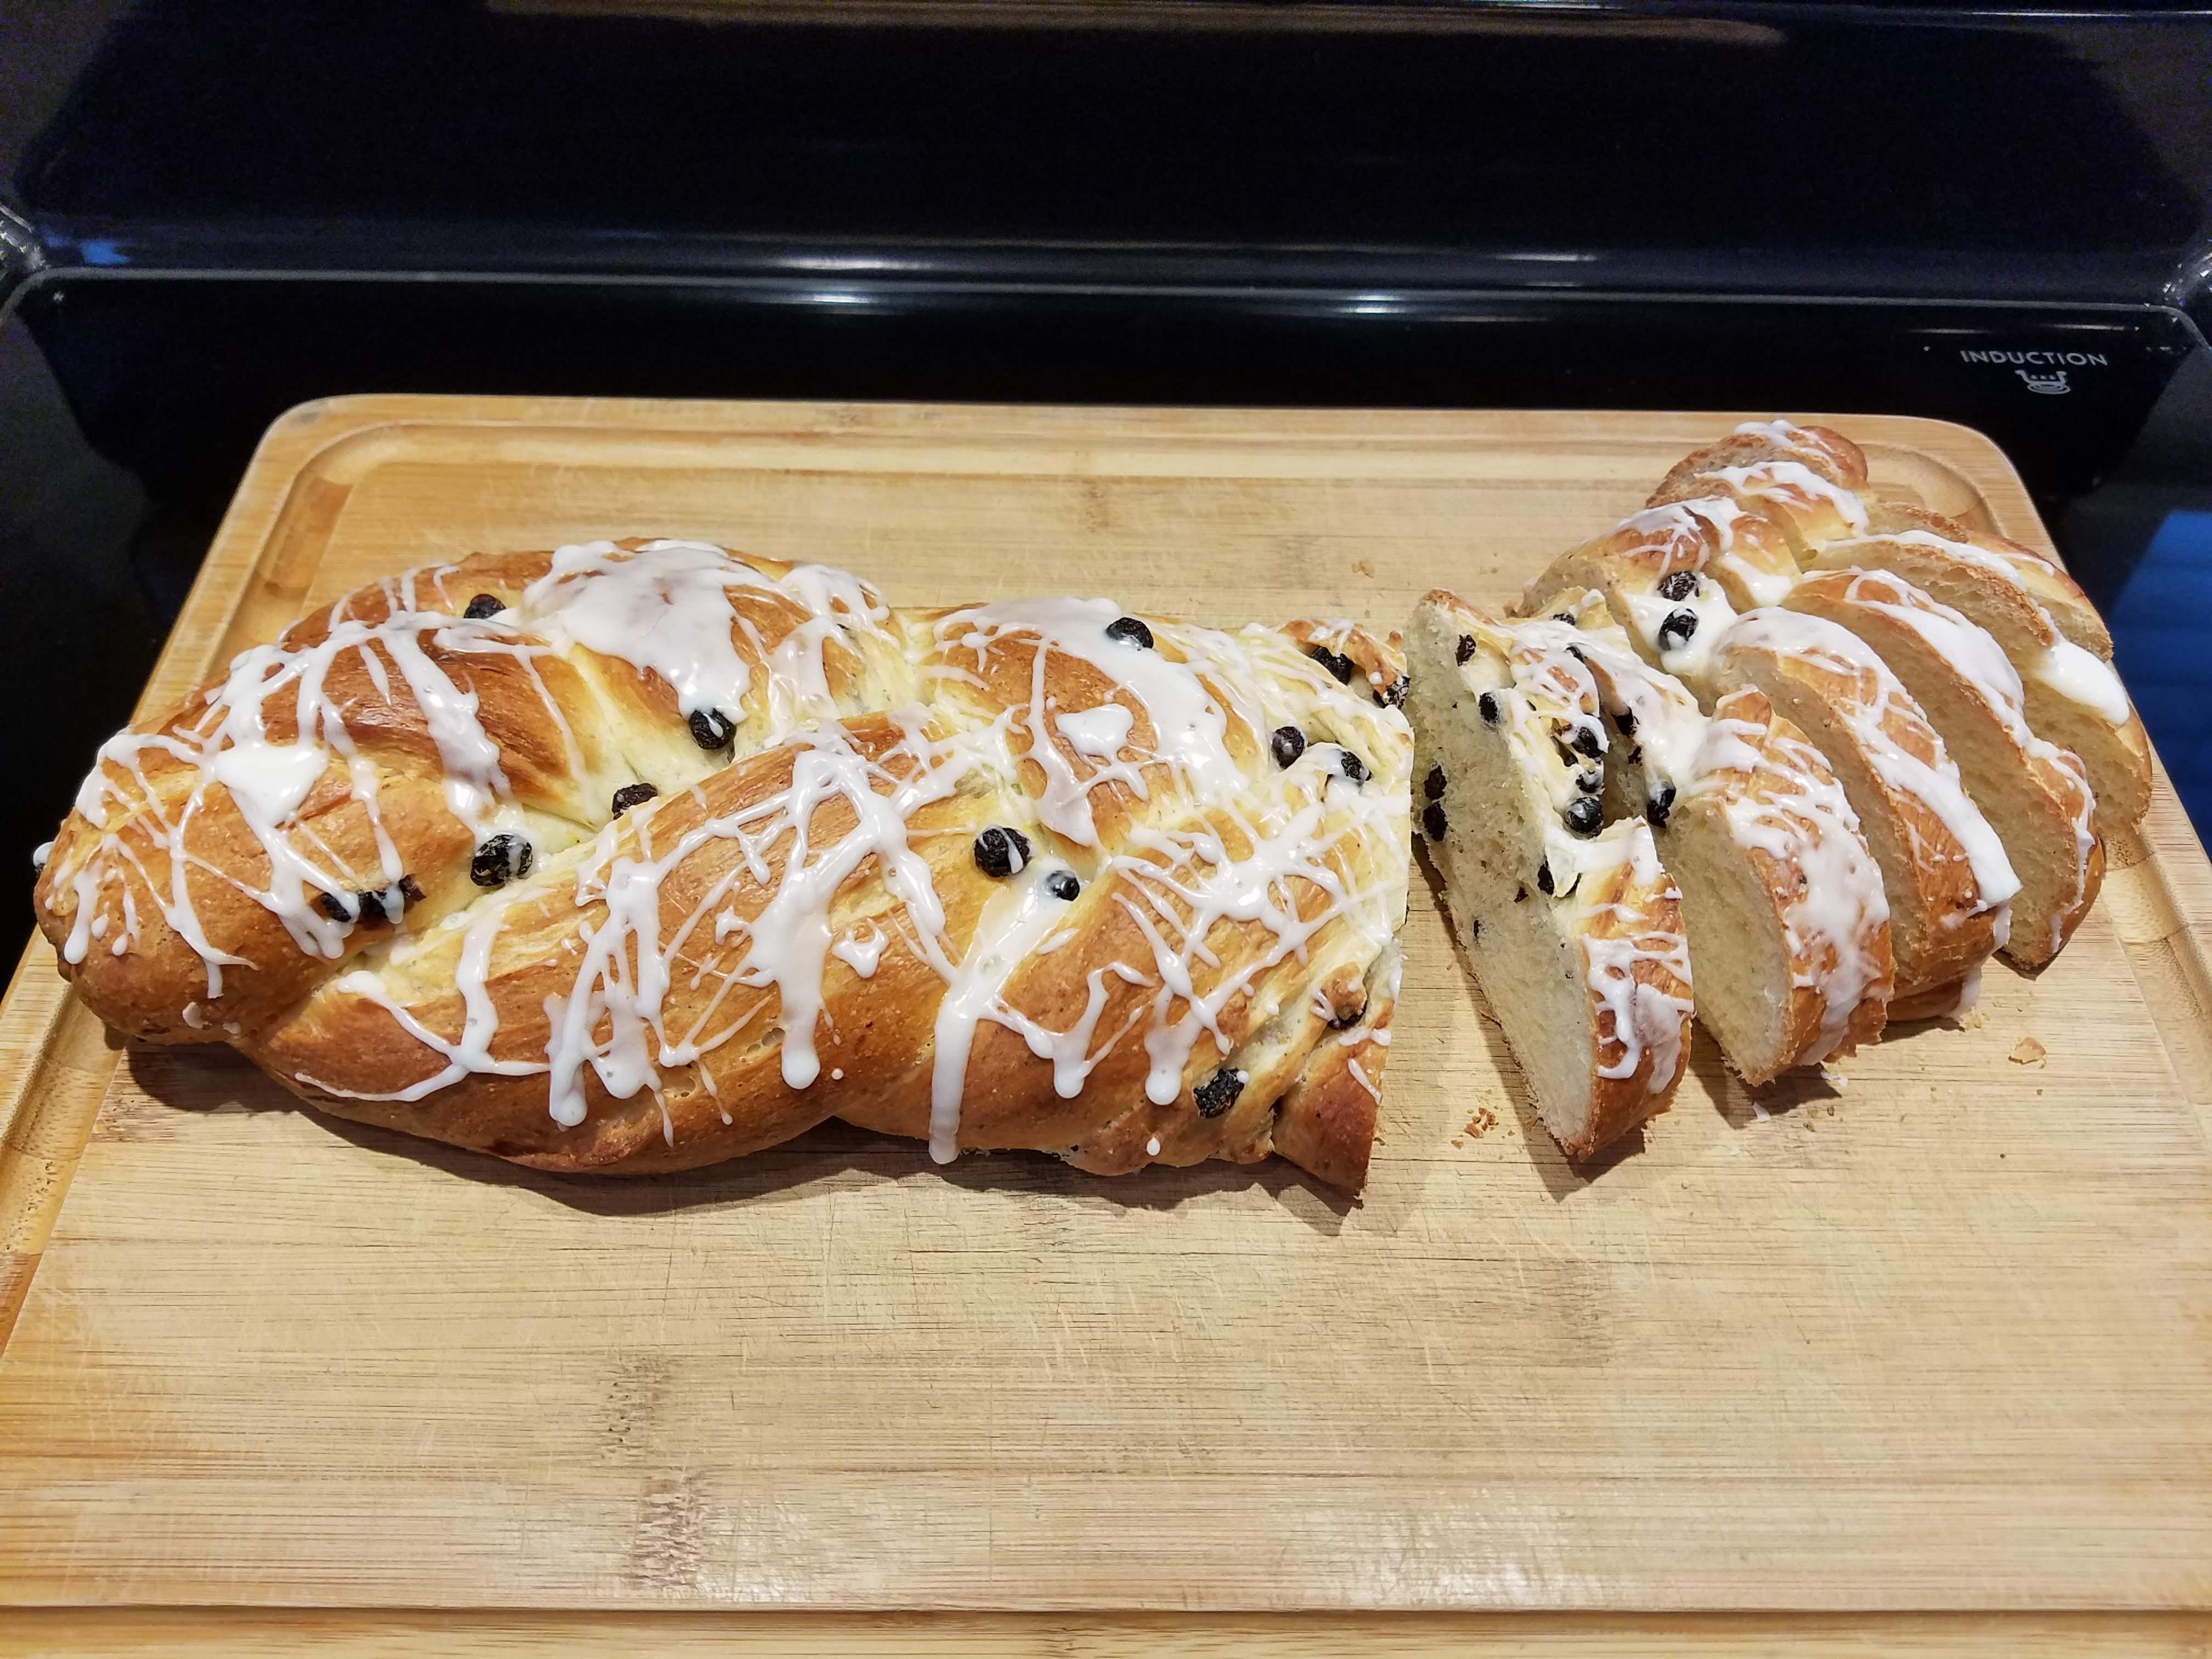 Lemon-Blueberry Yeast Bread Kim